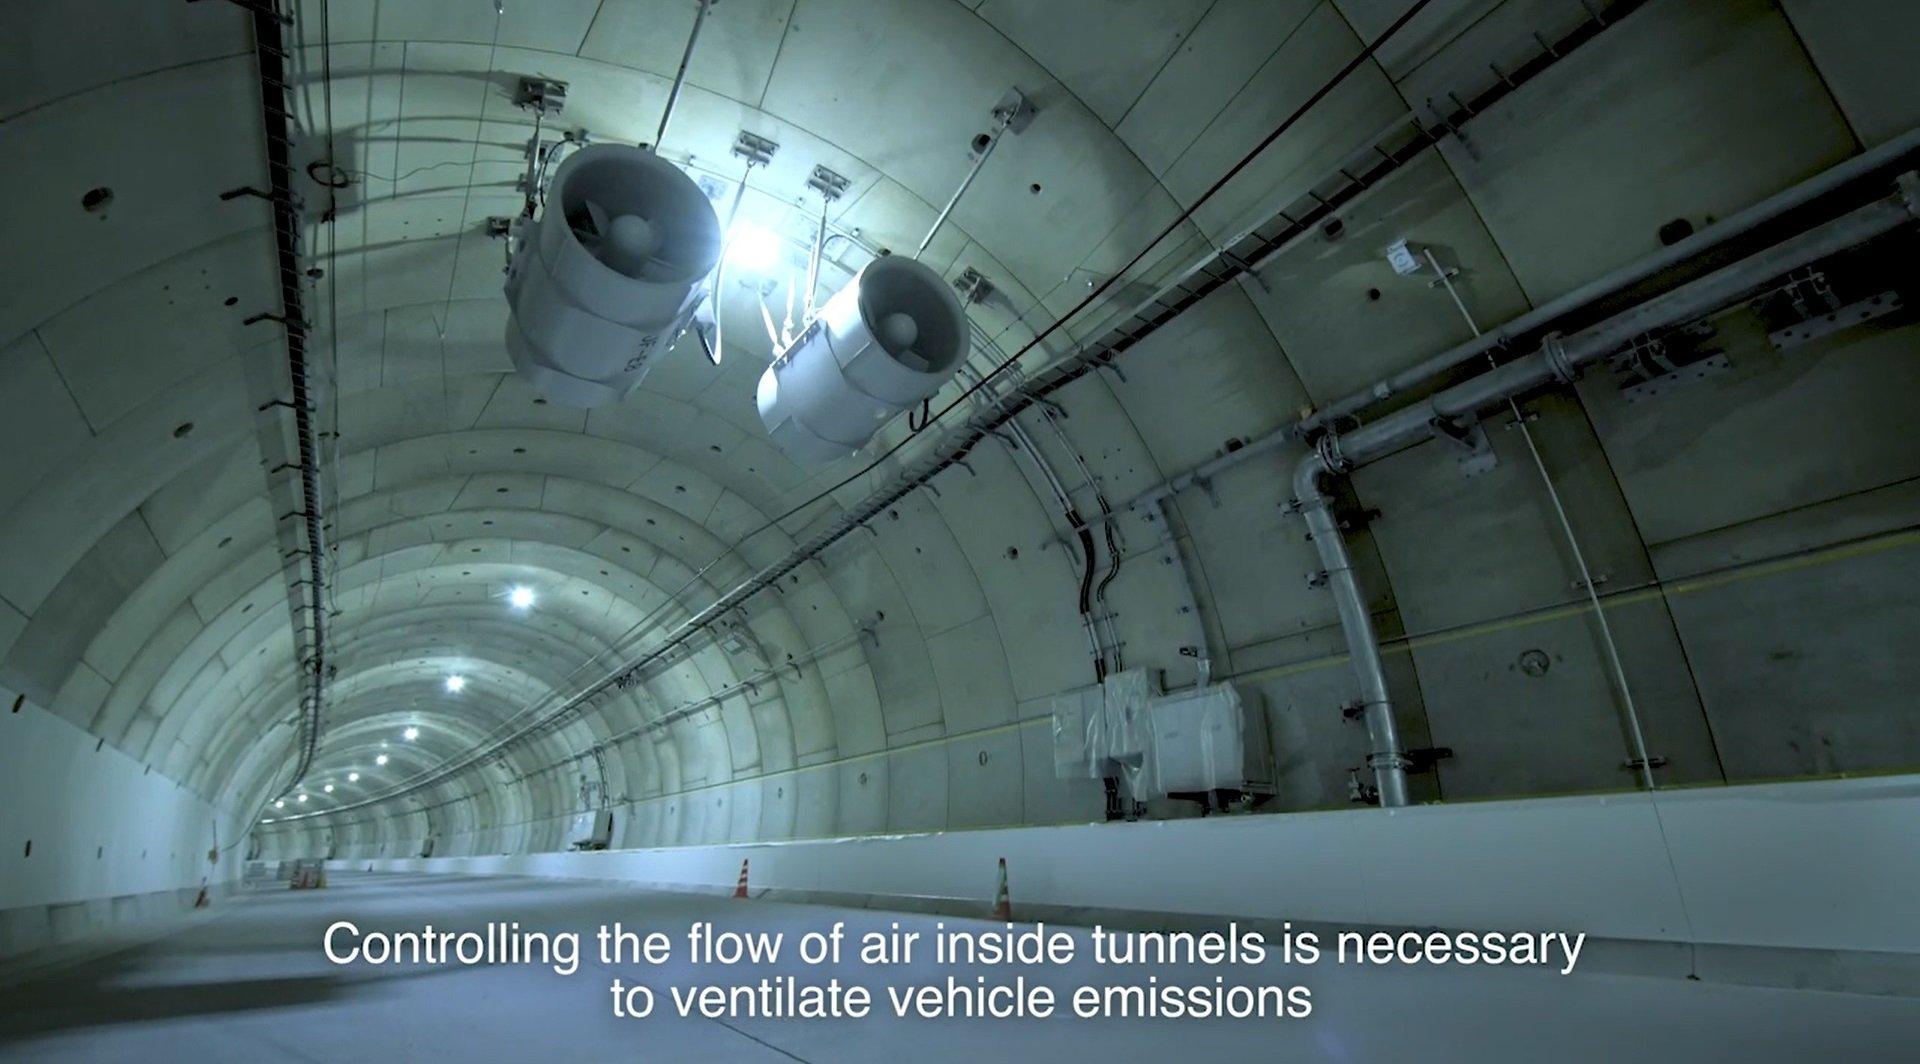 Panasonic's Tunnel Ventilation Solutions